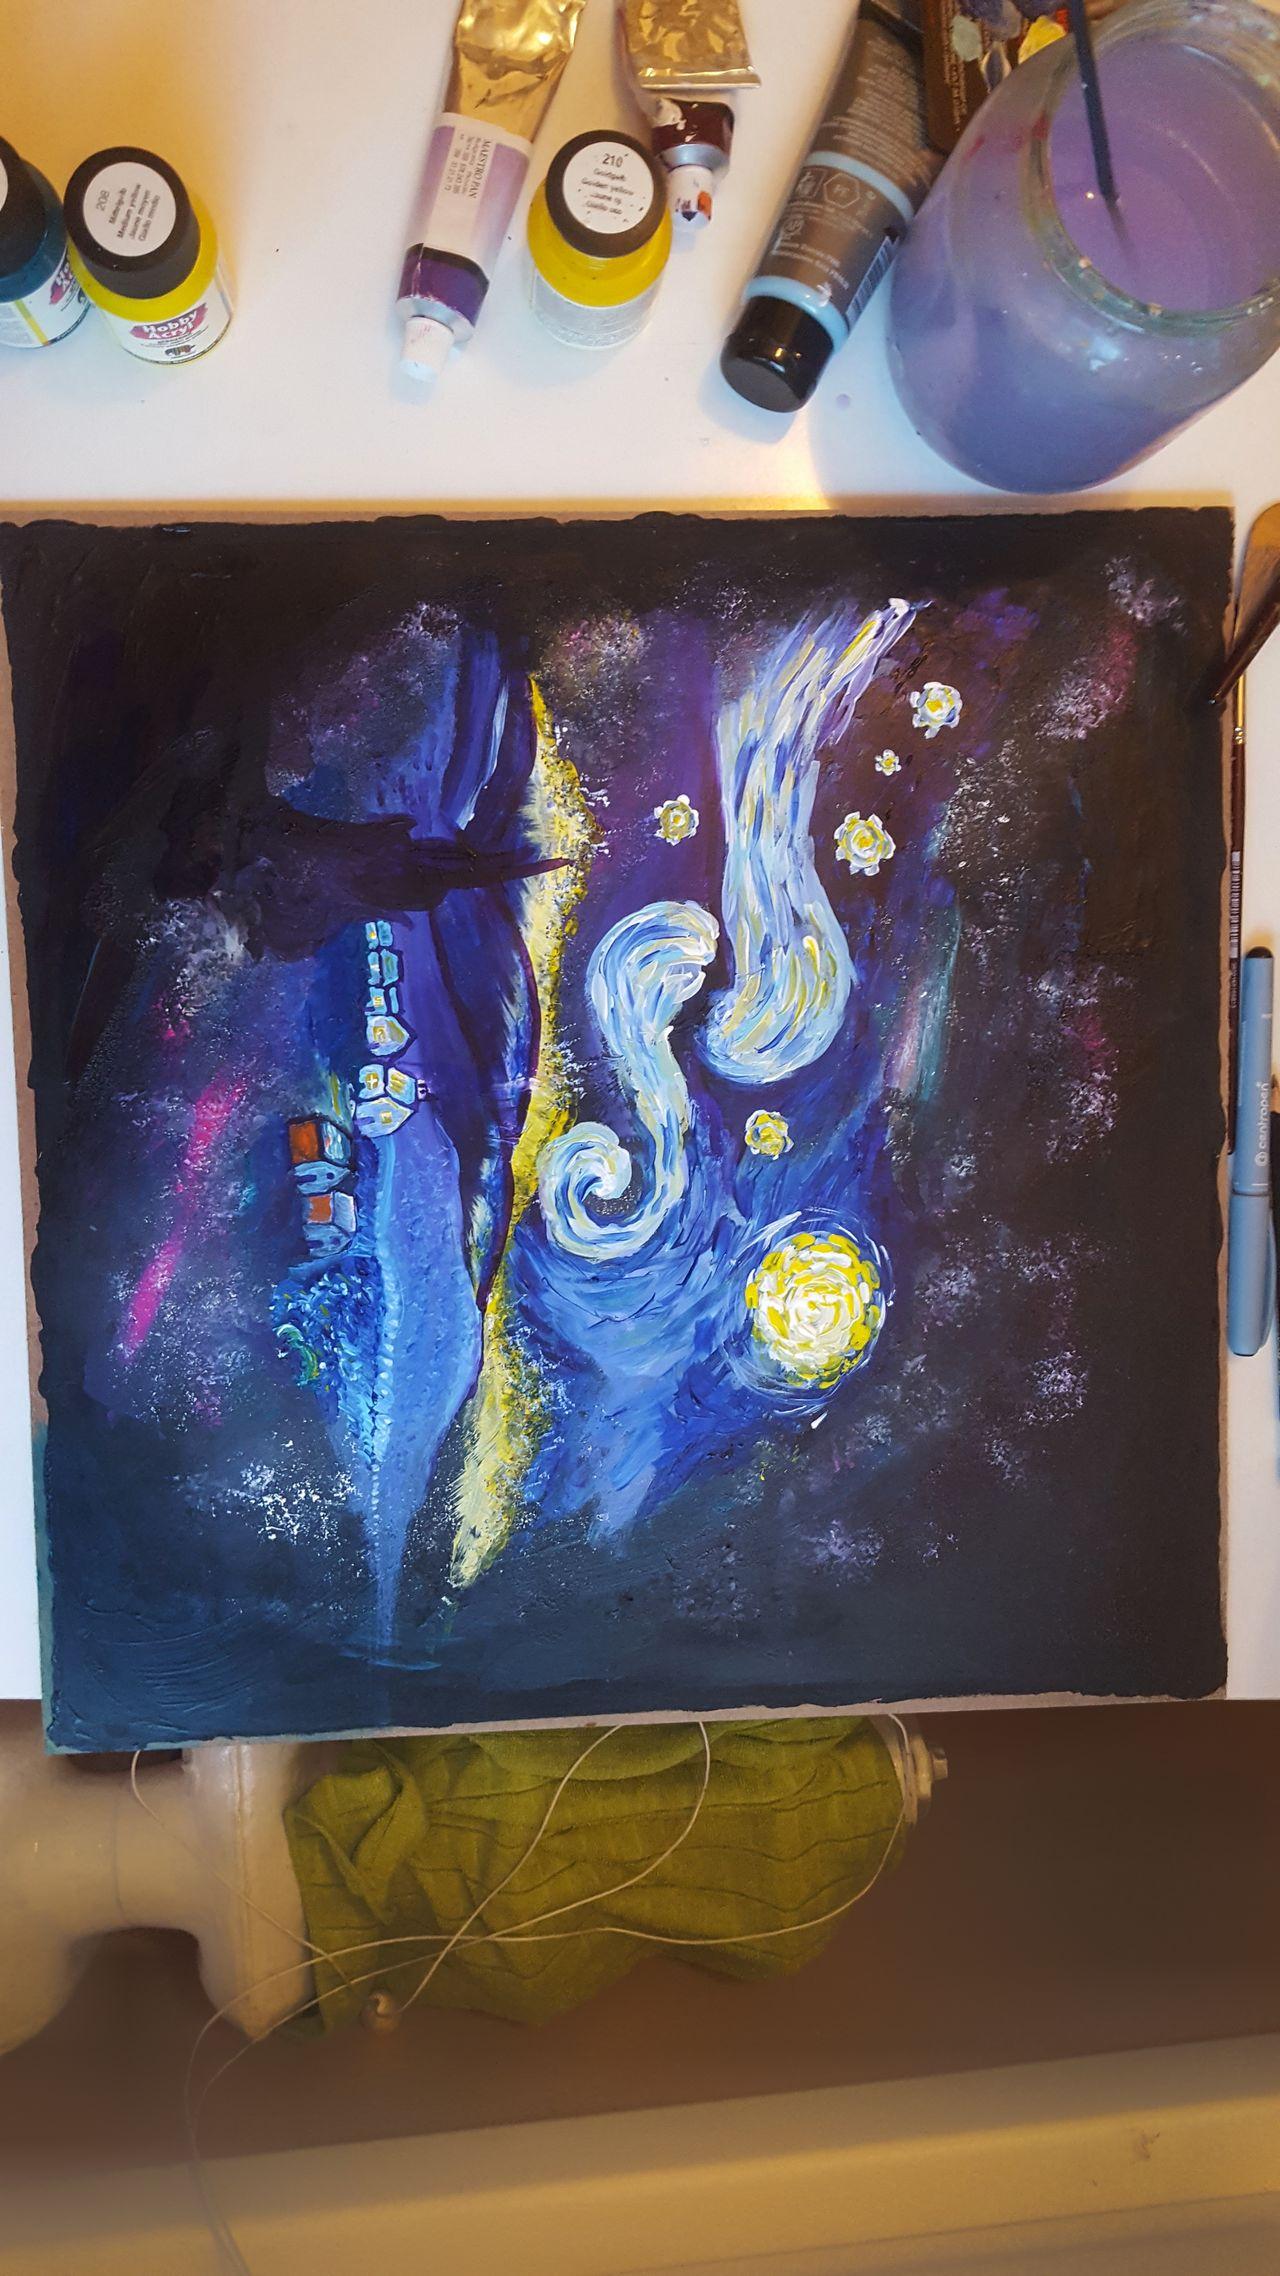 Painting Art Van Gogh Space Work In Progress Night Starry Night Messy